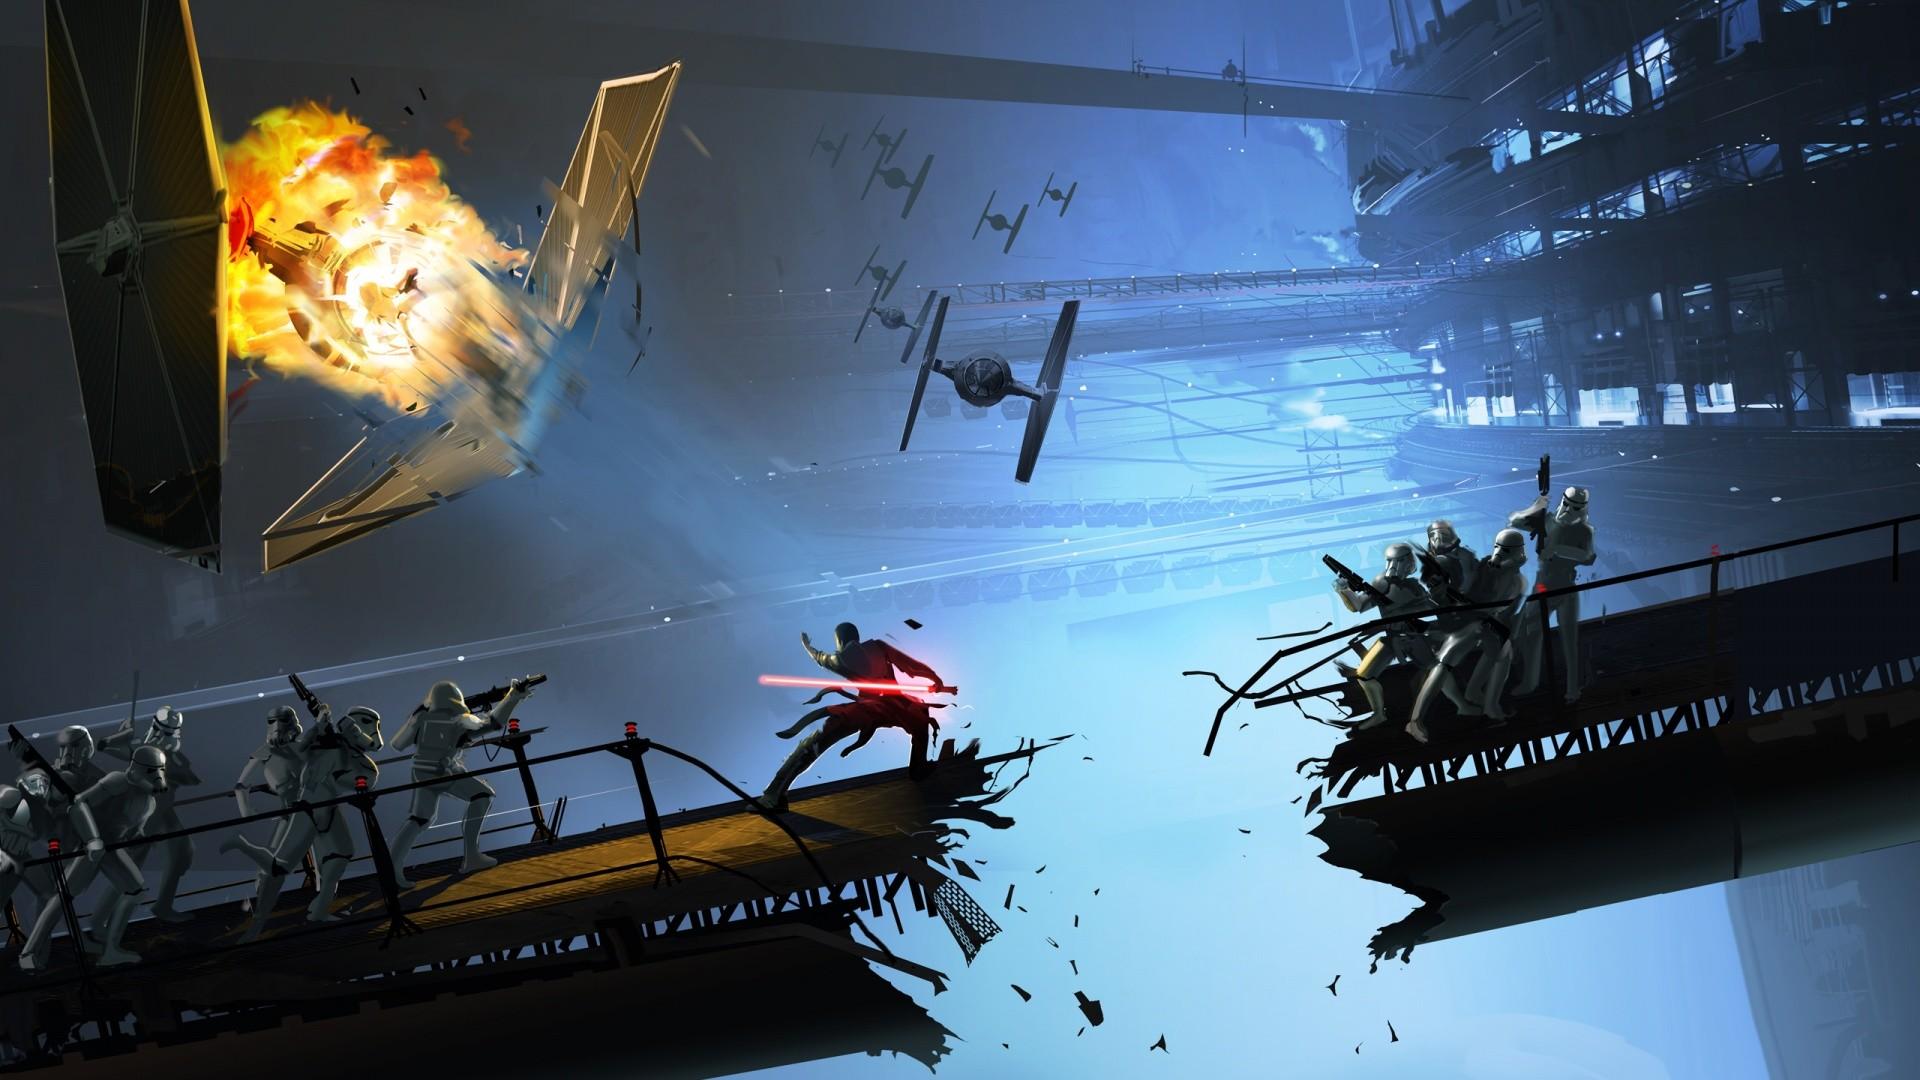 Star Wars Concept Art Wallpapers